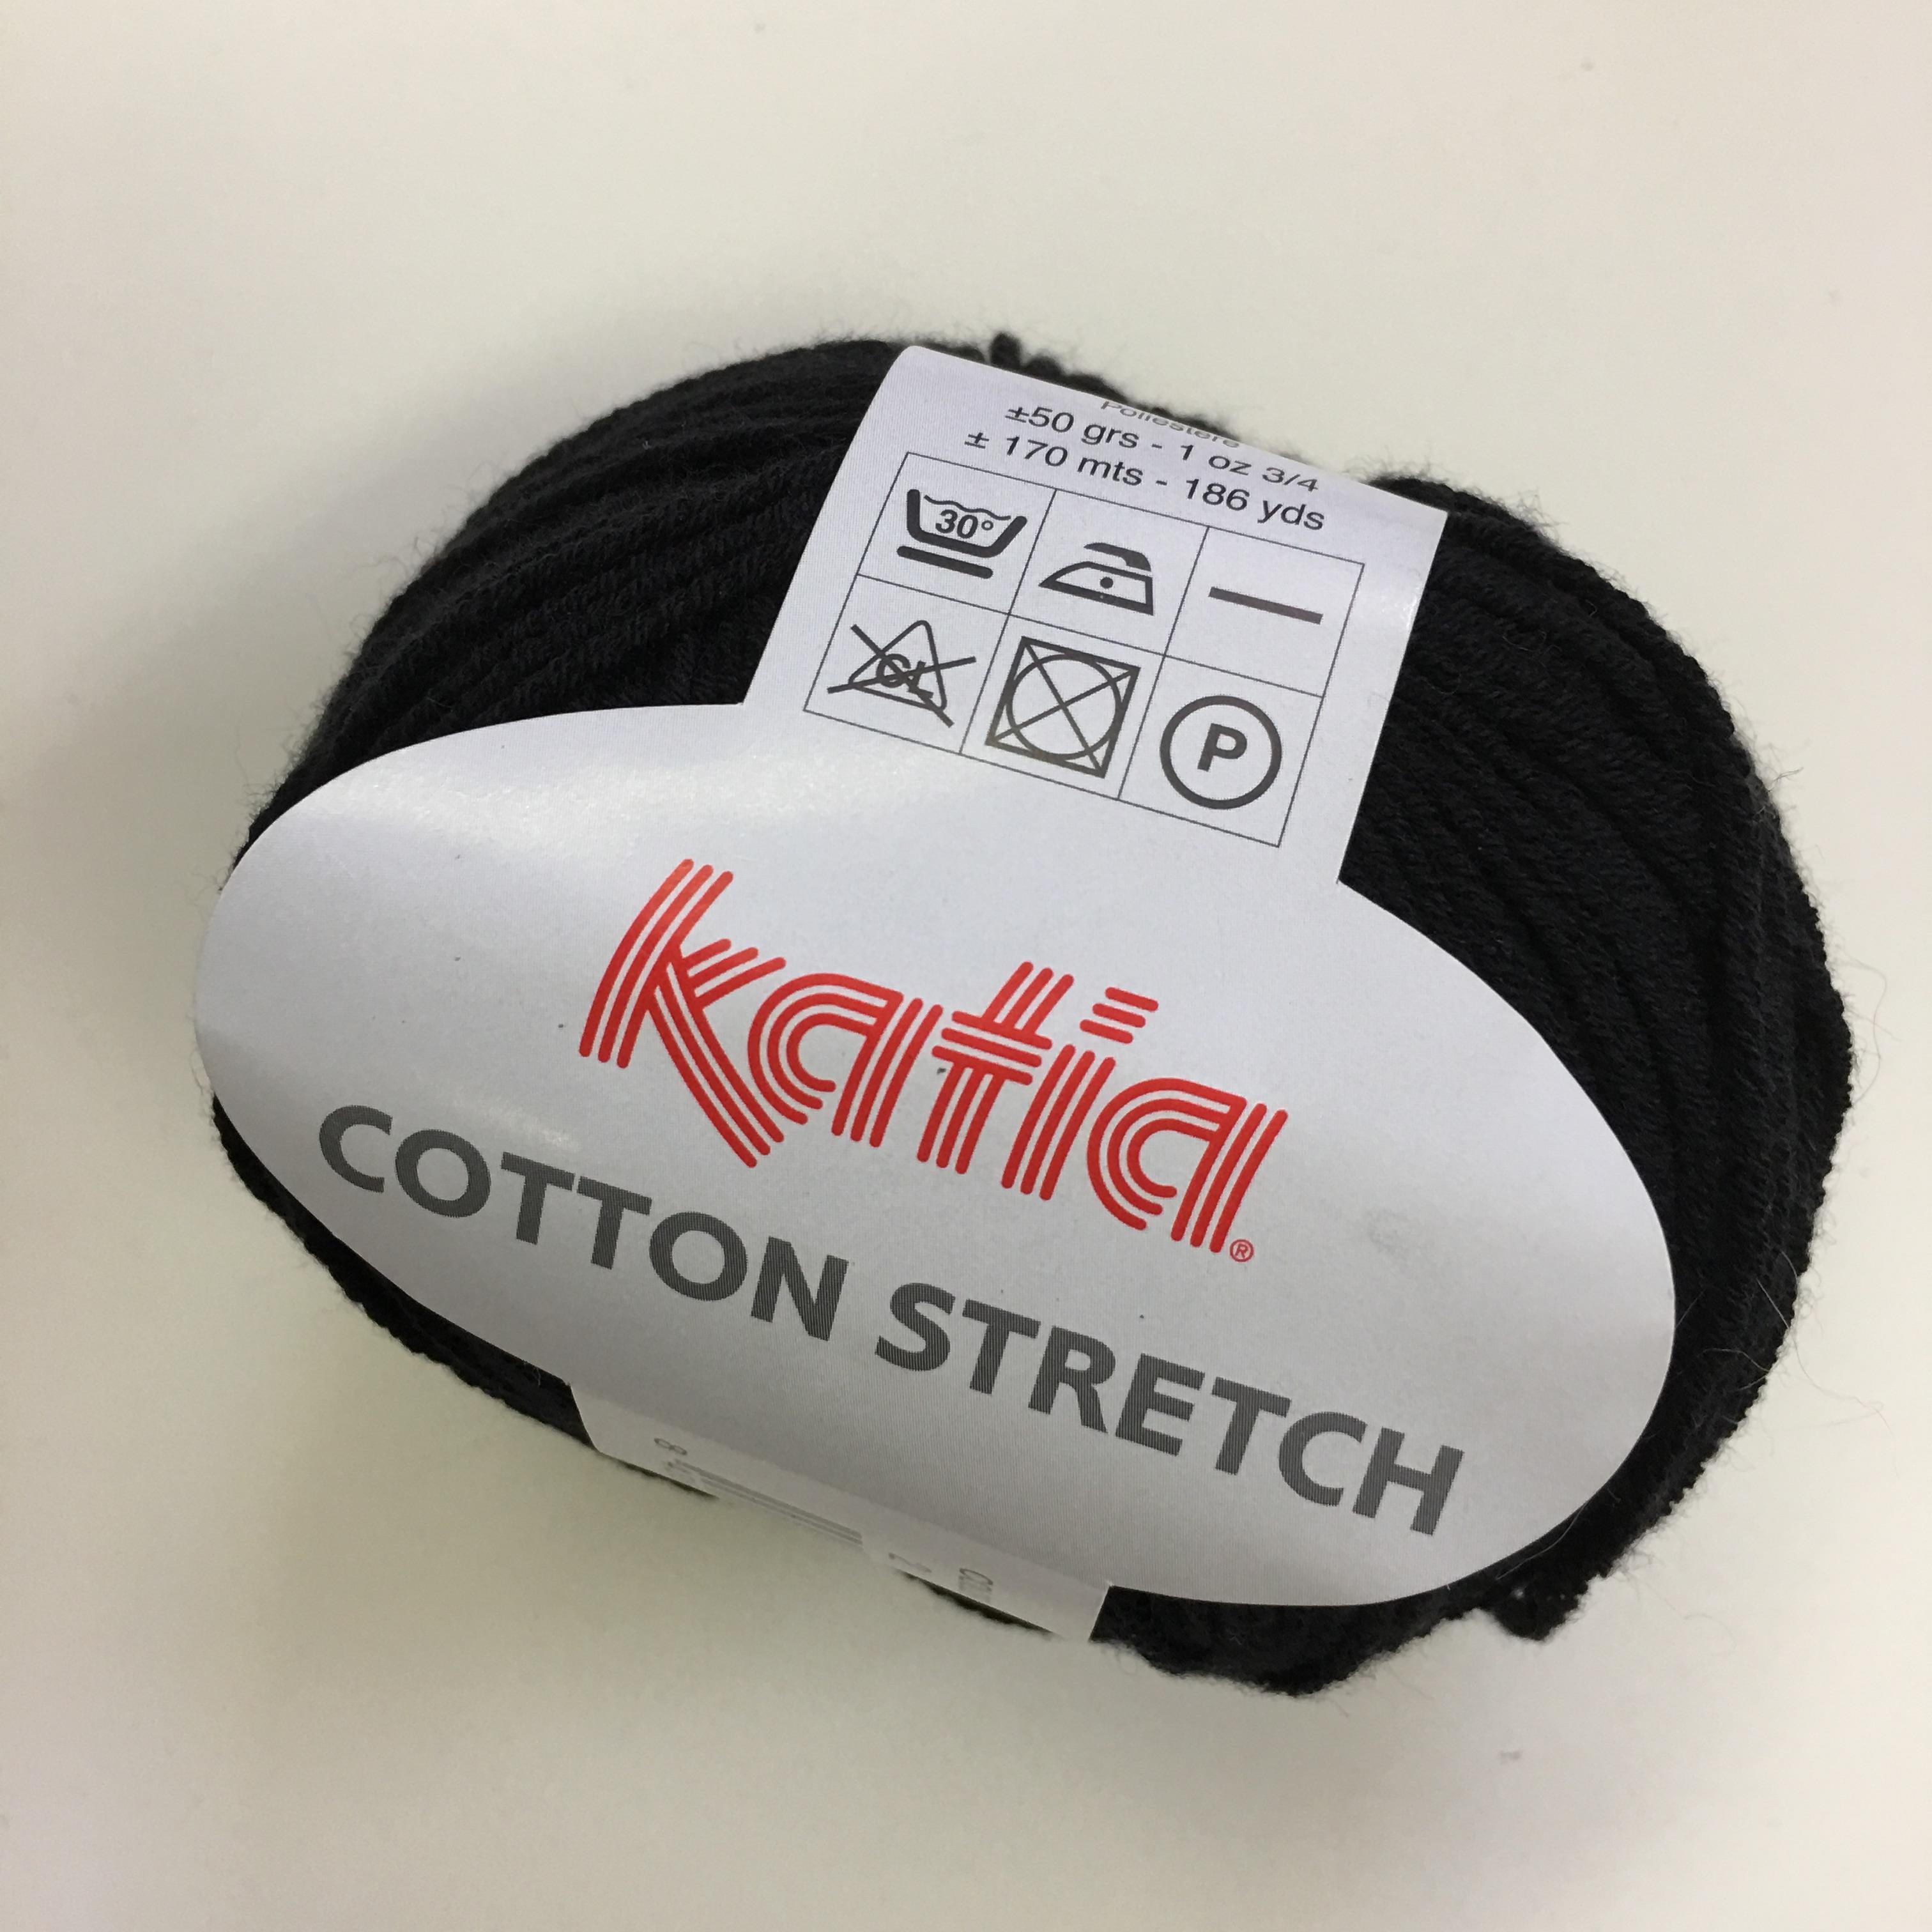 Katia Cotton Stretch